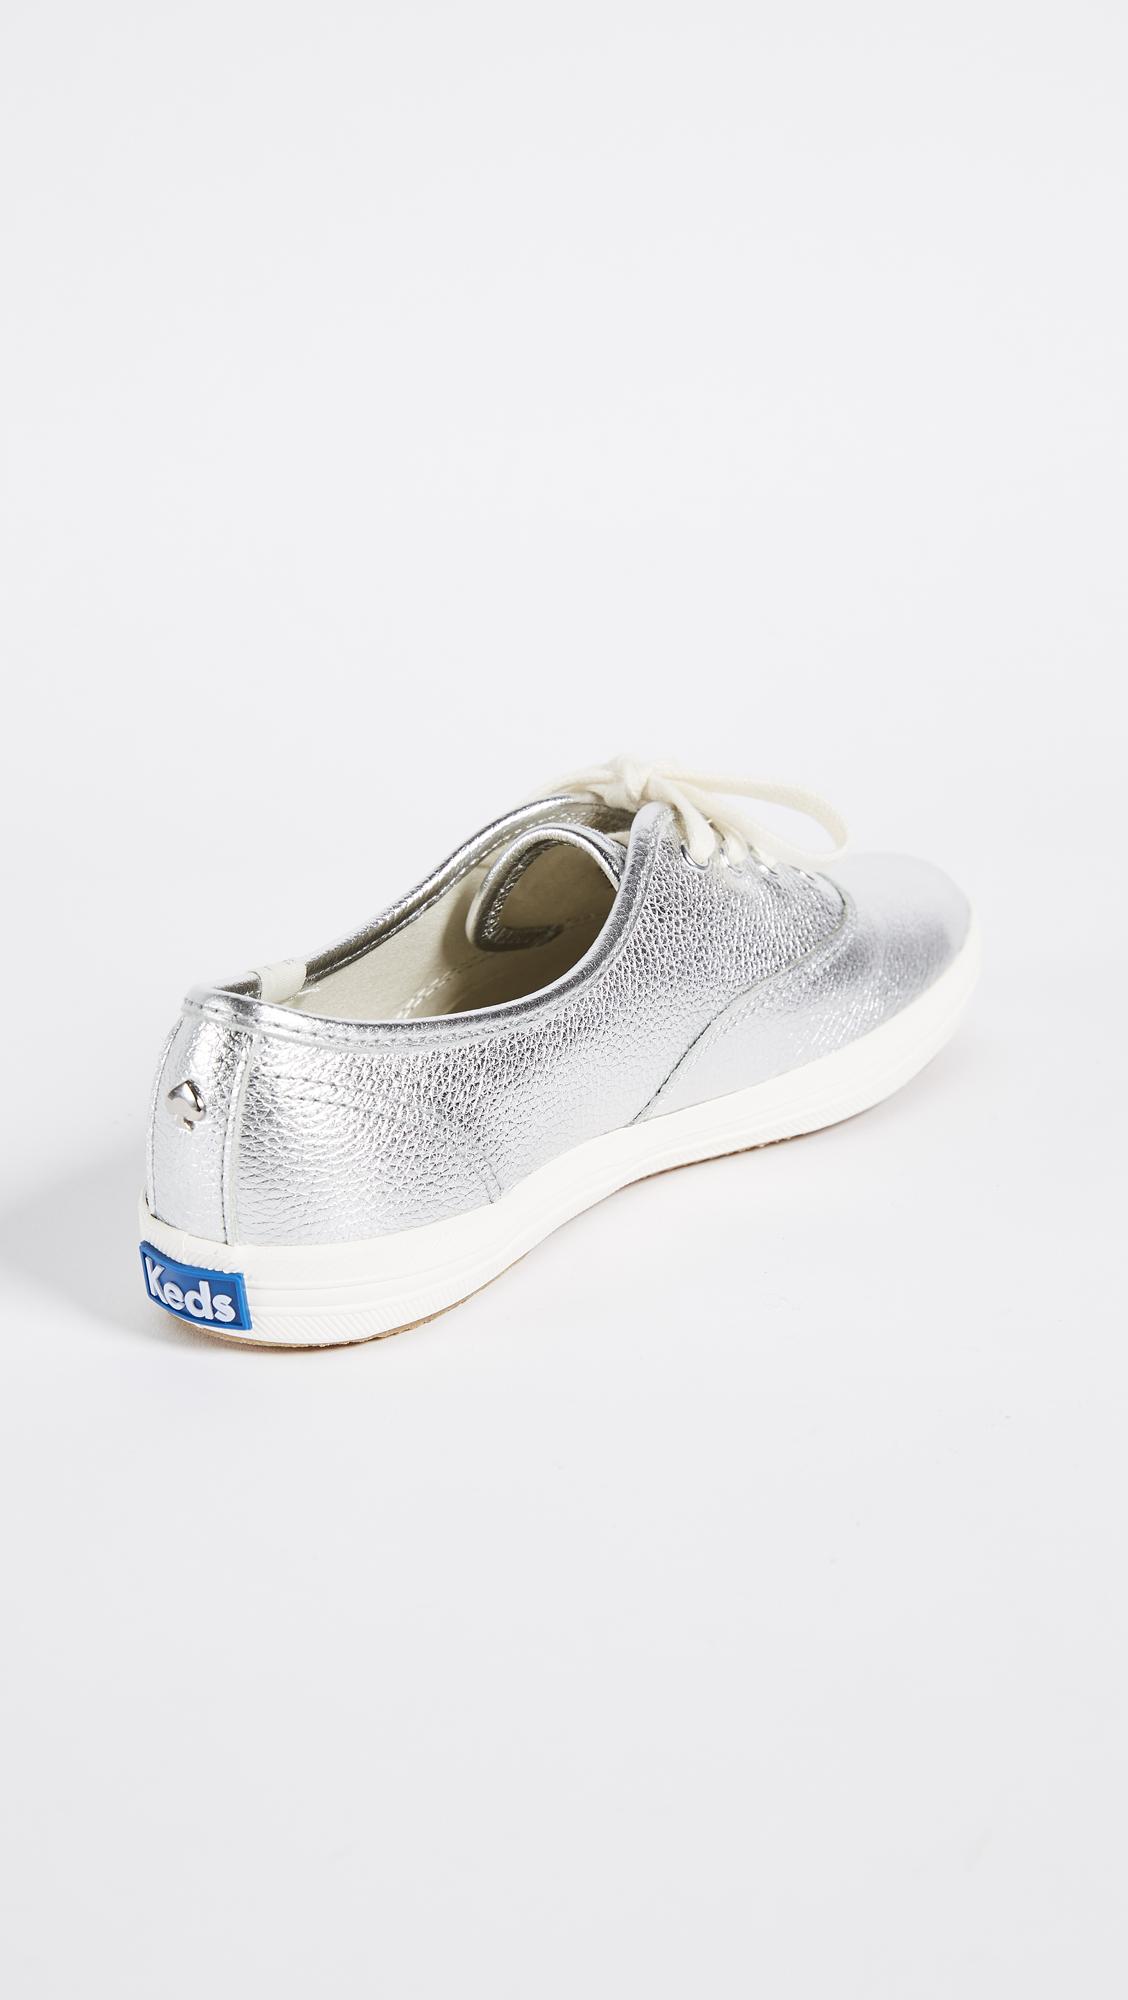 155f20ac3da1 Keds x Kate Spade New York Sneakers